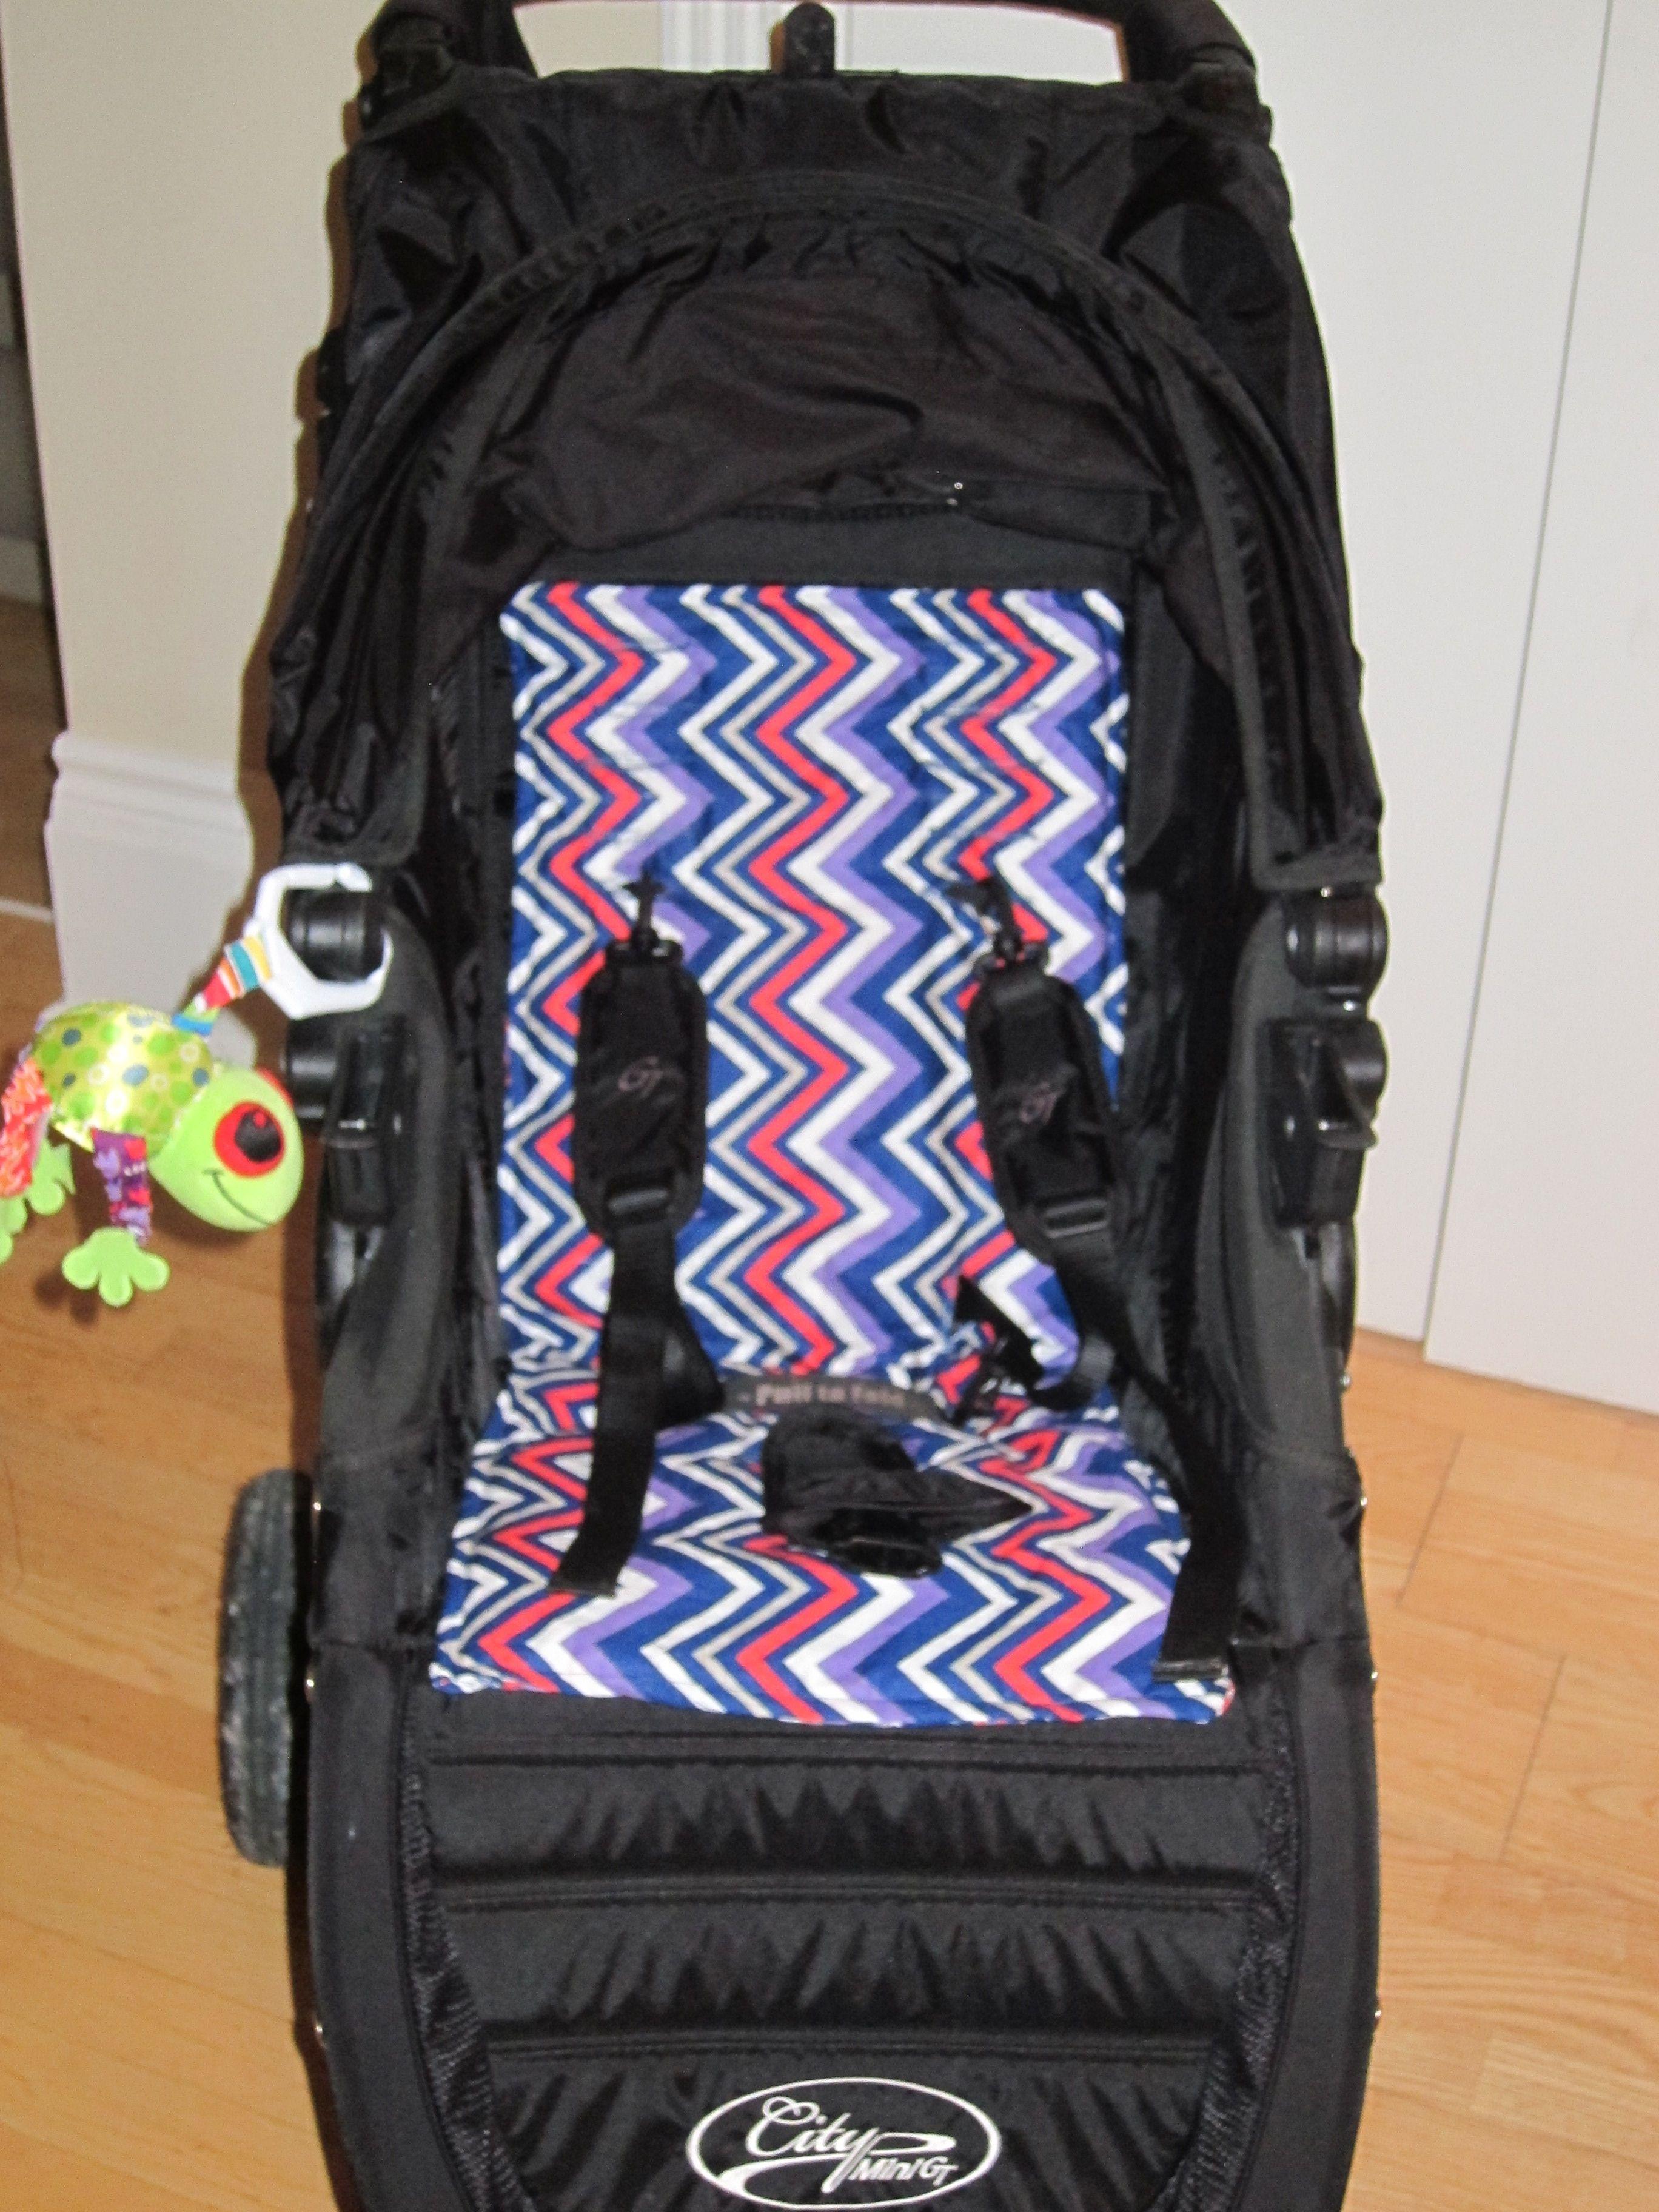 DIY Stroller Seat Liner City mini stroller, Stroller